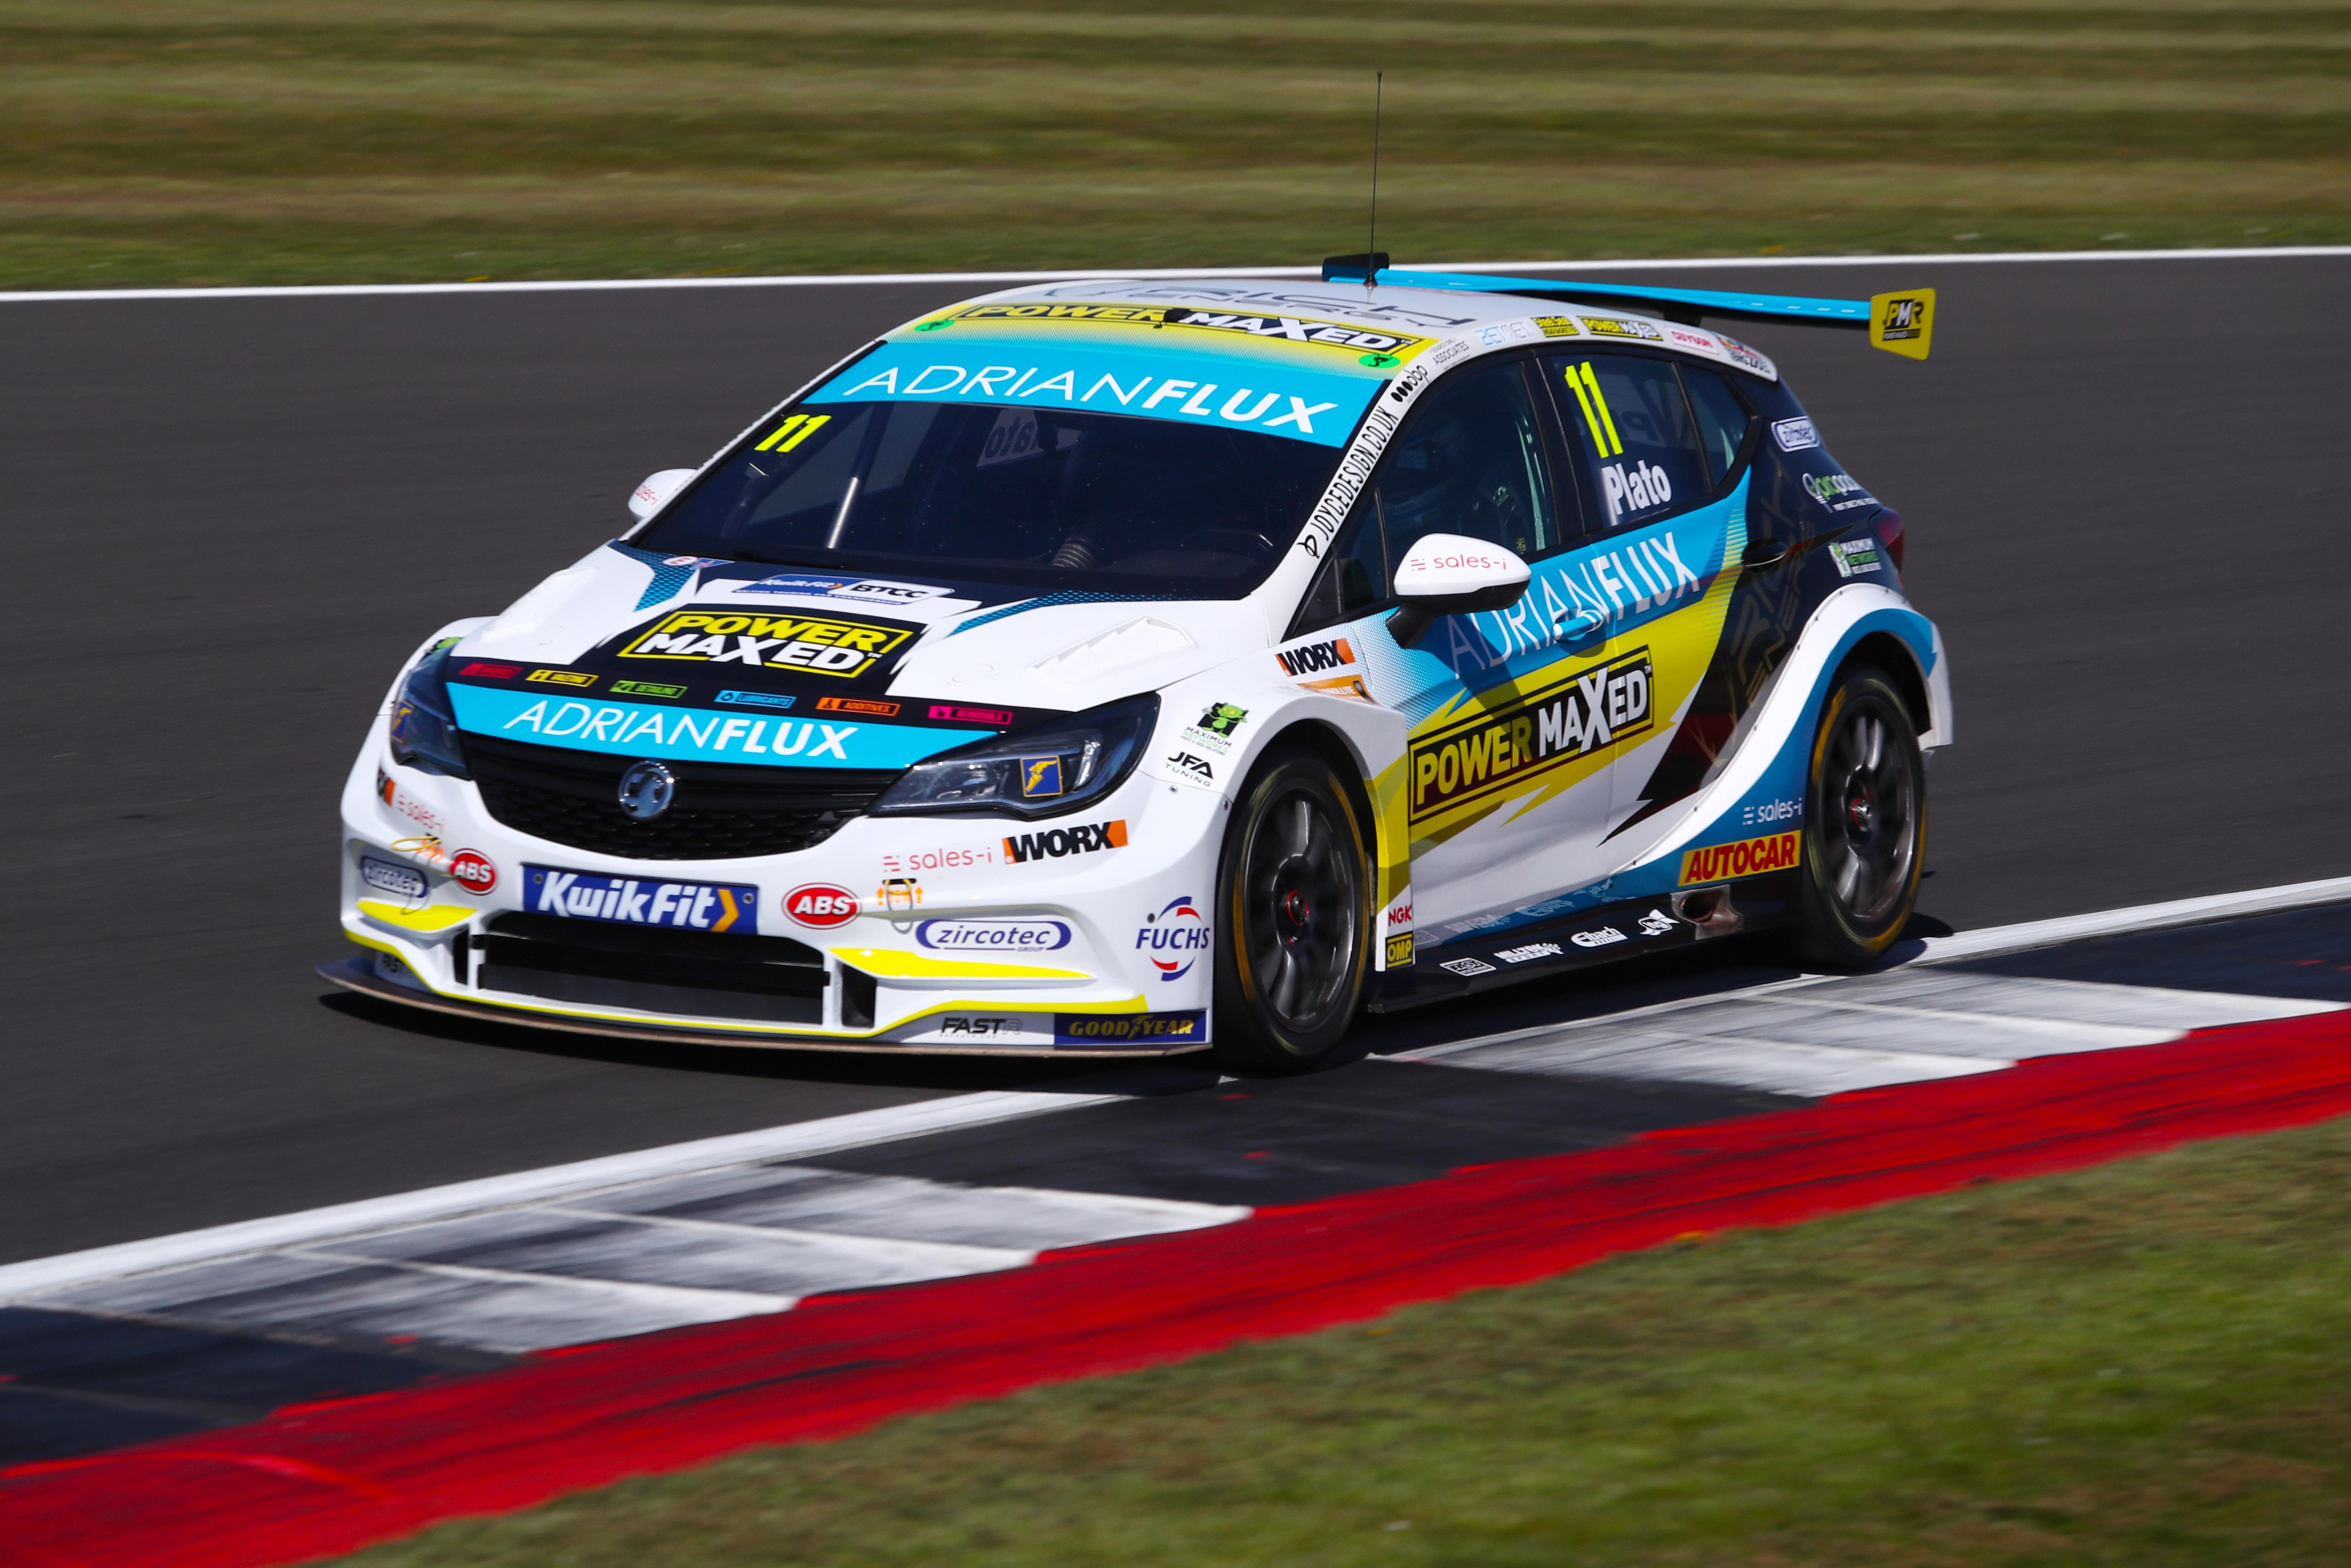 Jason Plato, British Touring Car Championship, Silverstone 2021